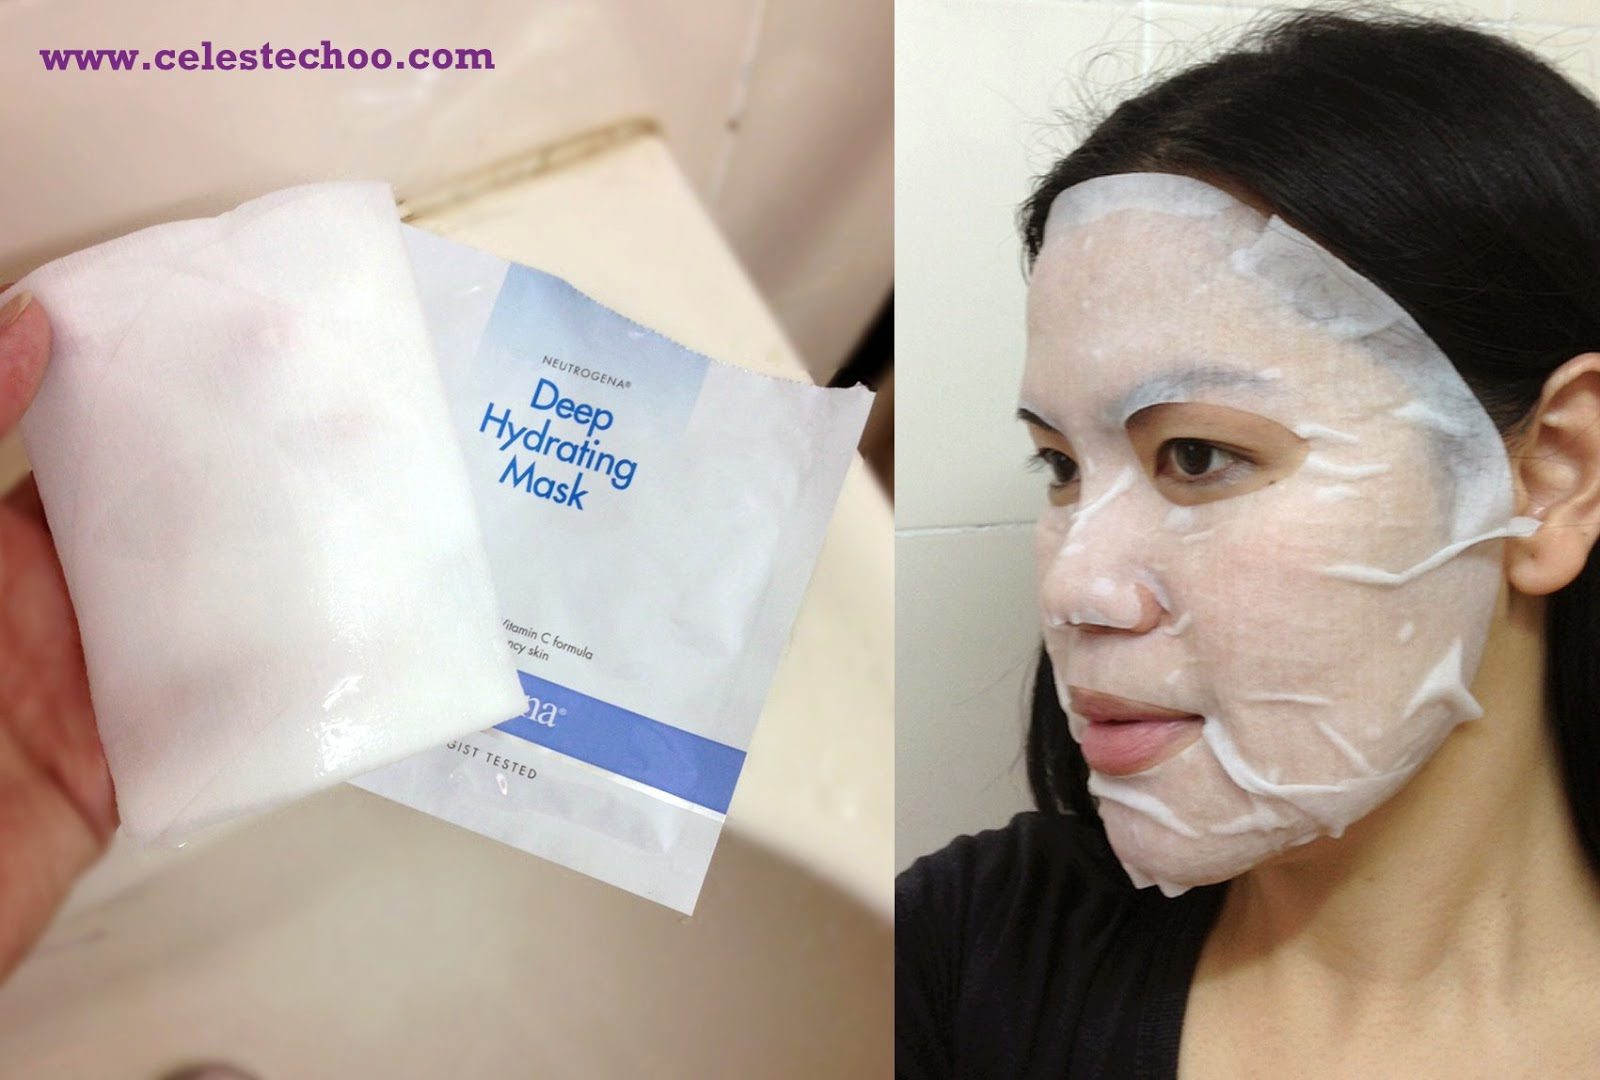 image-neutrogena-deep-hydrating-mask-product-review